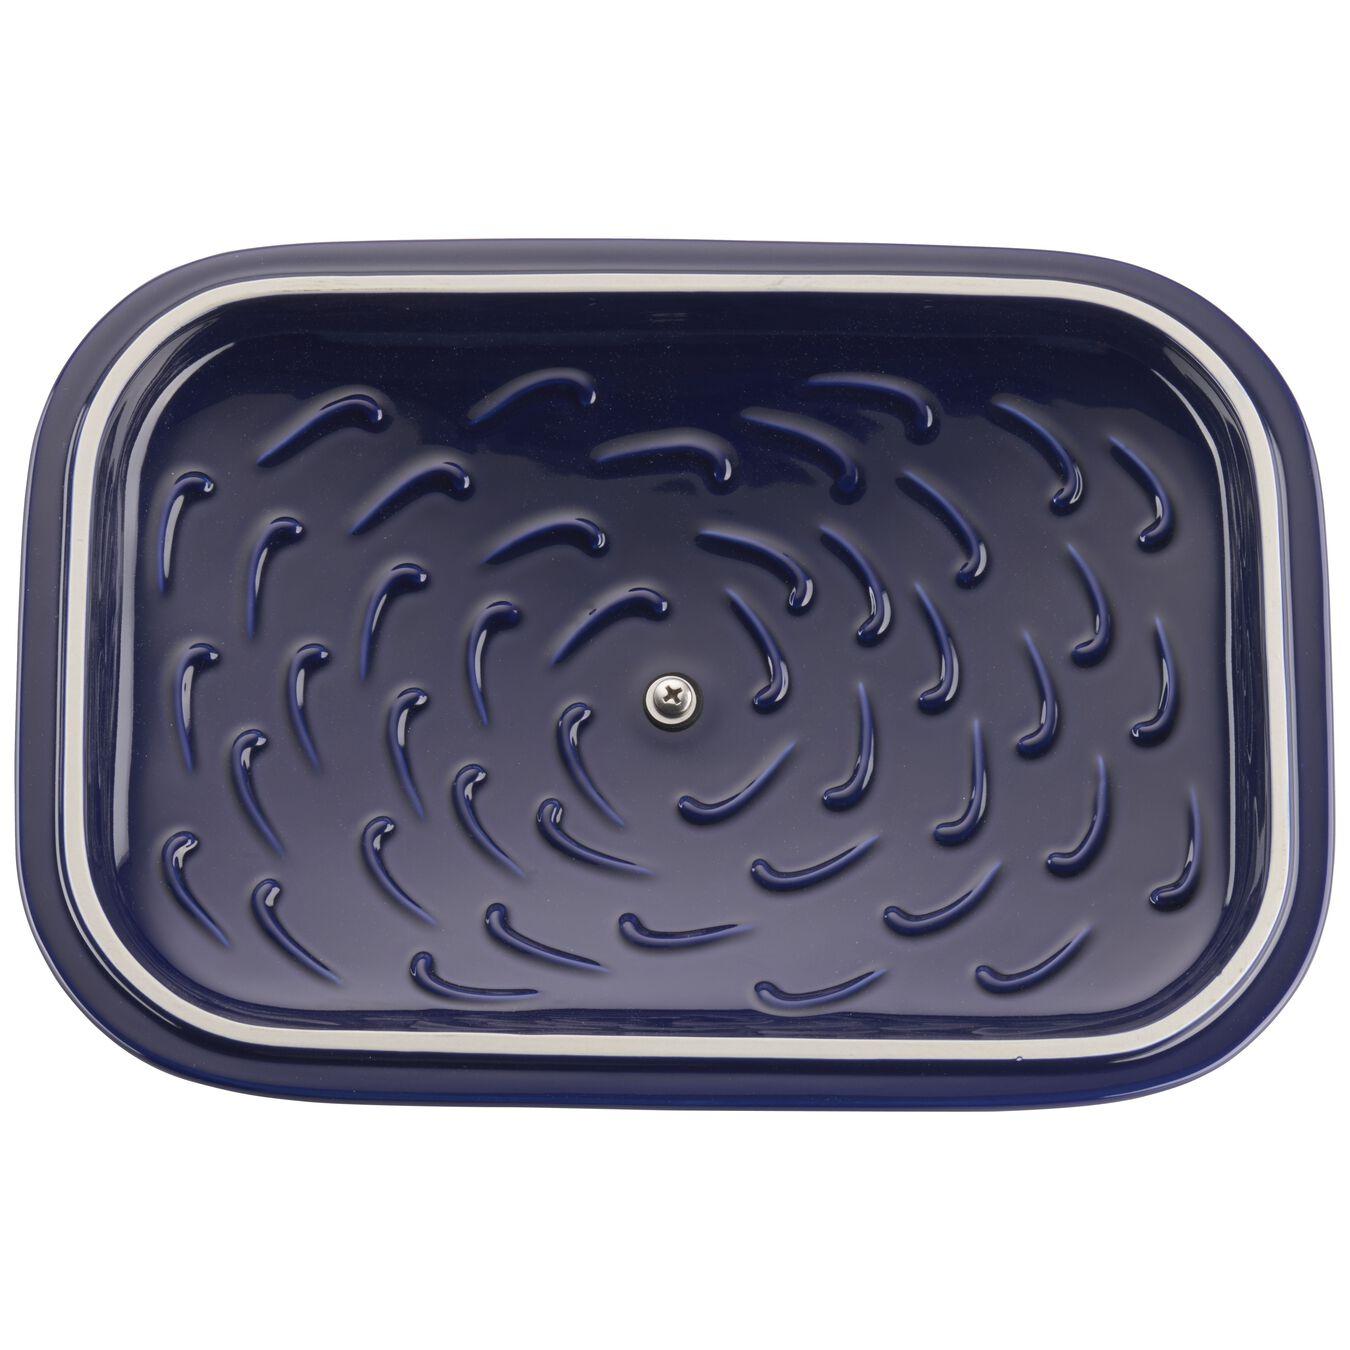 Ceramic rectangular Moules de forme spéciale, Dark-Blue,,large 3